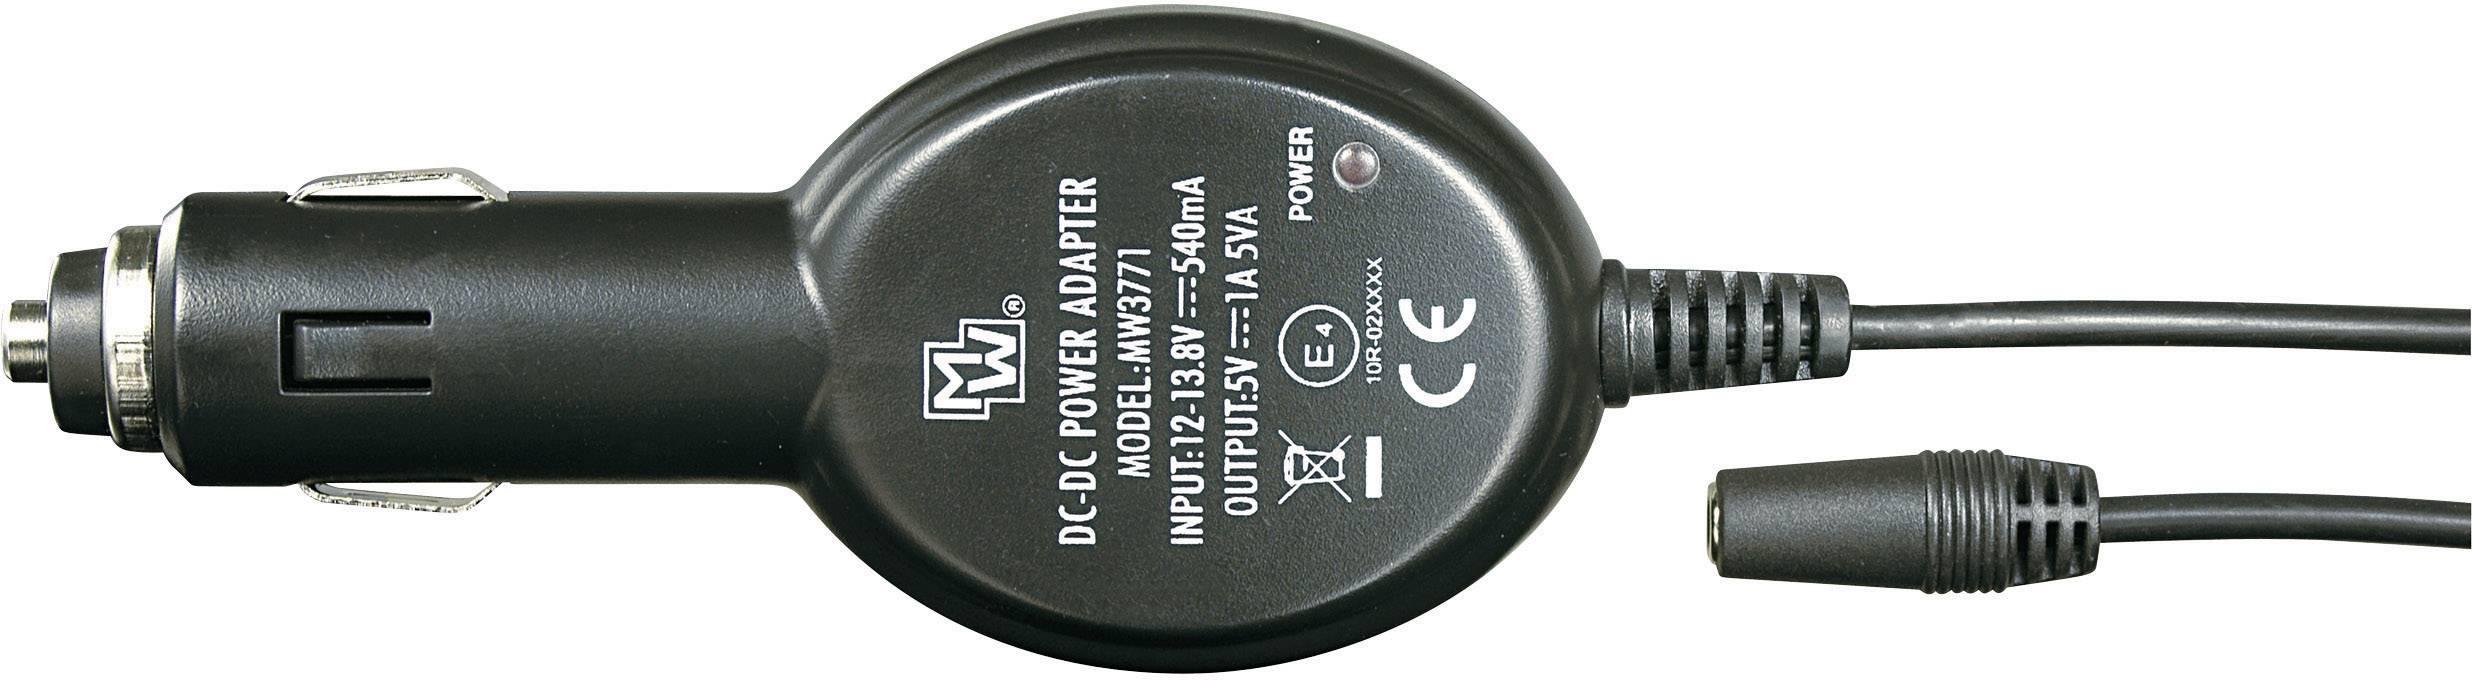 voltcraft 12 v car charger cables suitable for cigarette lighter and standard sockets [ 1000 x 1000 Pixel ]